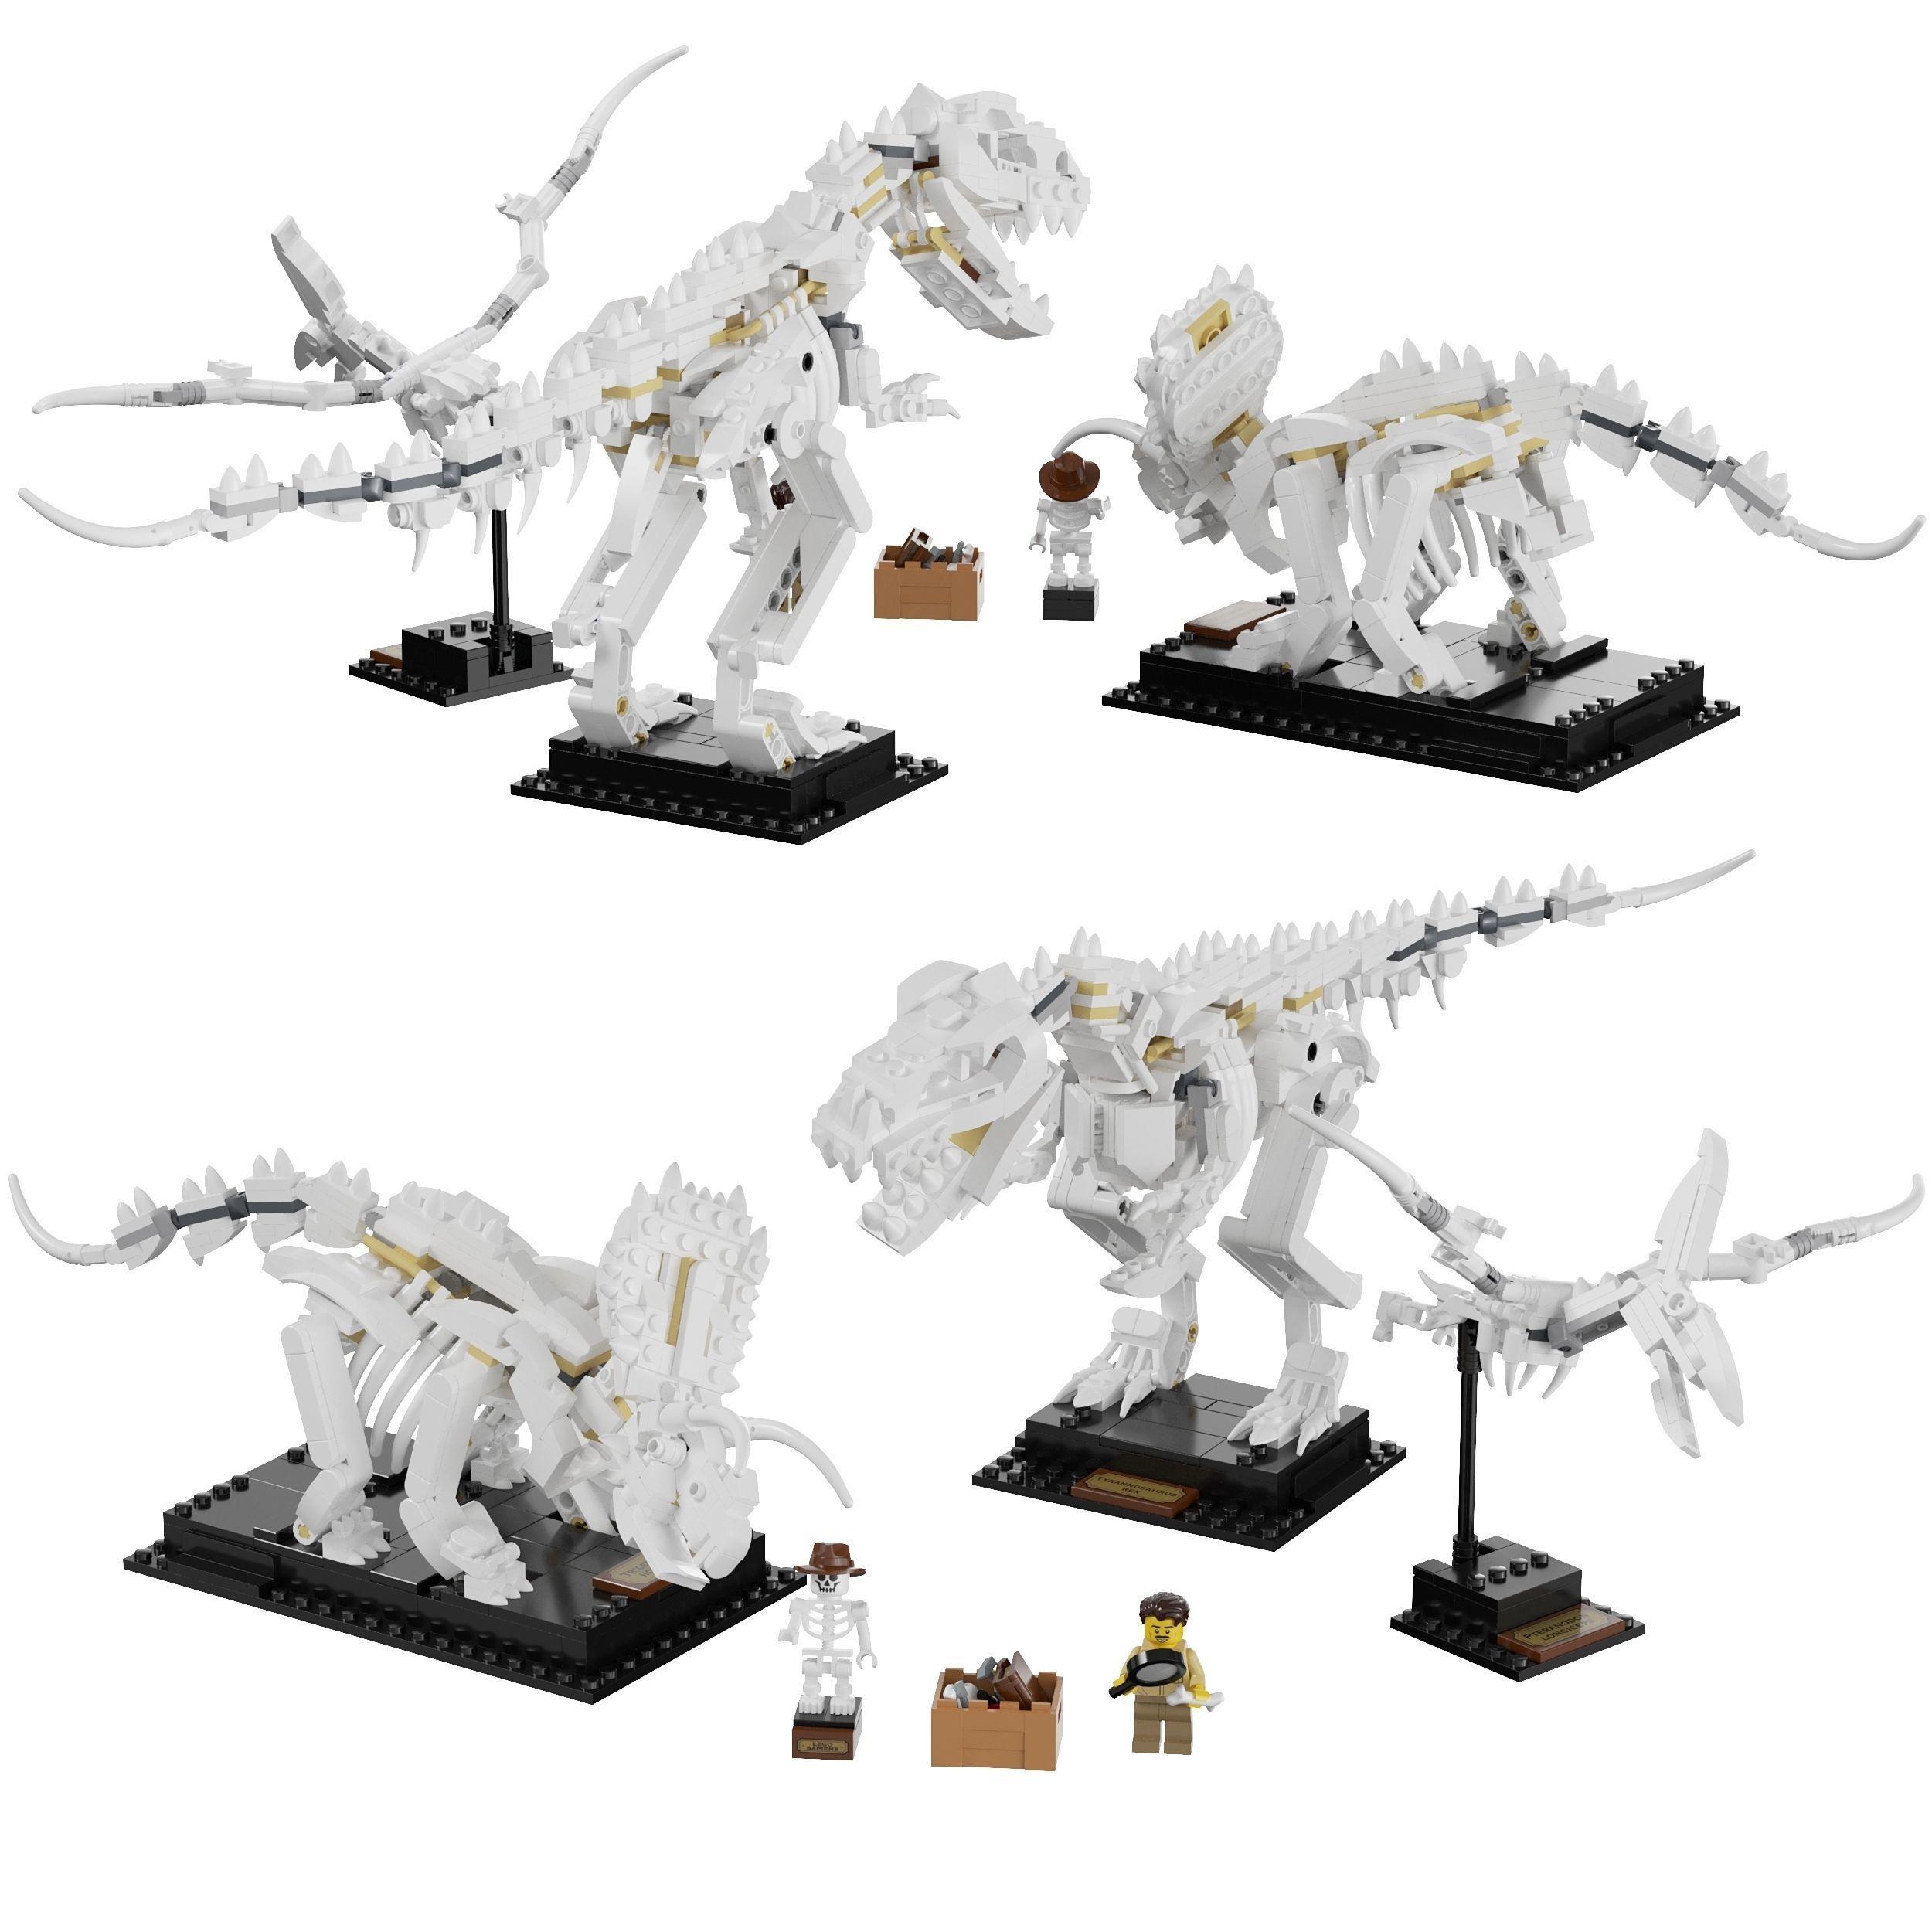 Lego - 21320 Dinosaur Fossils